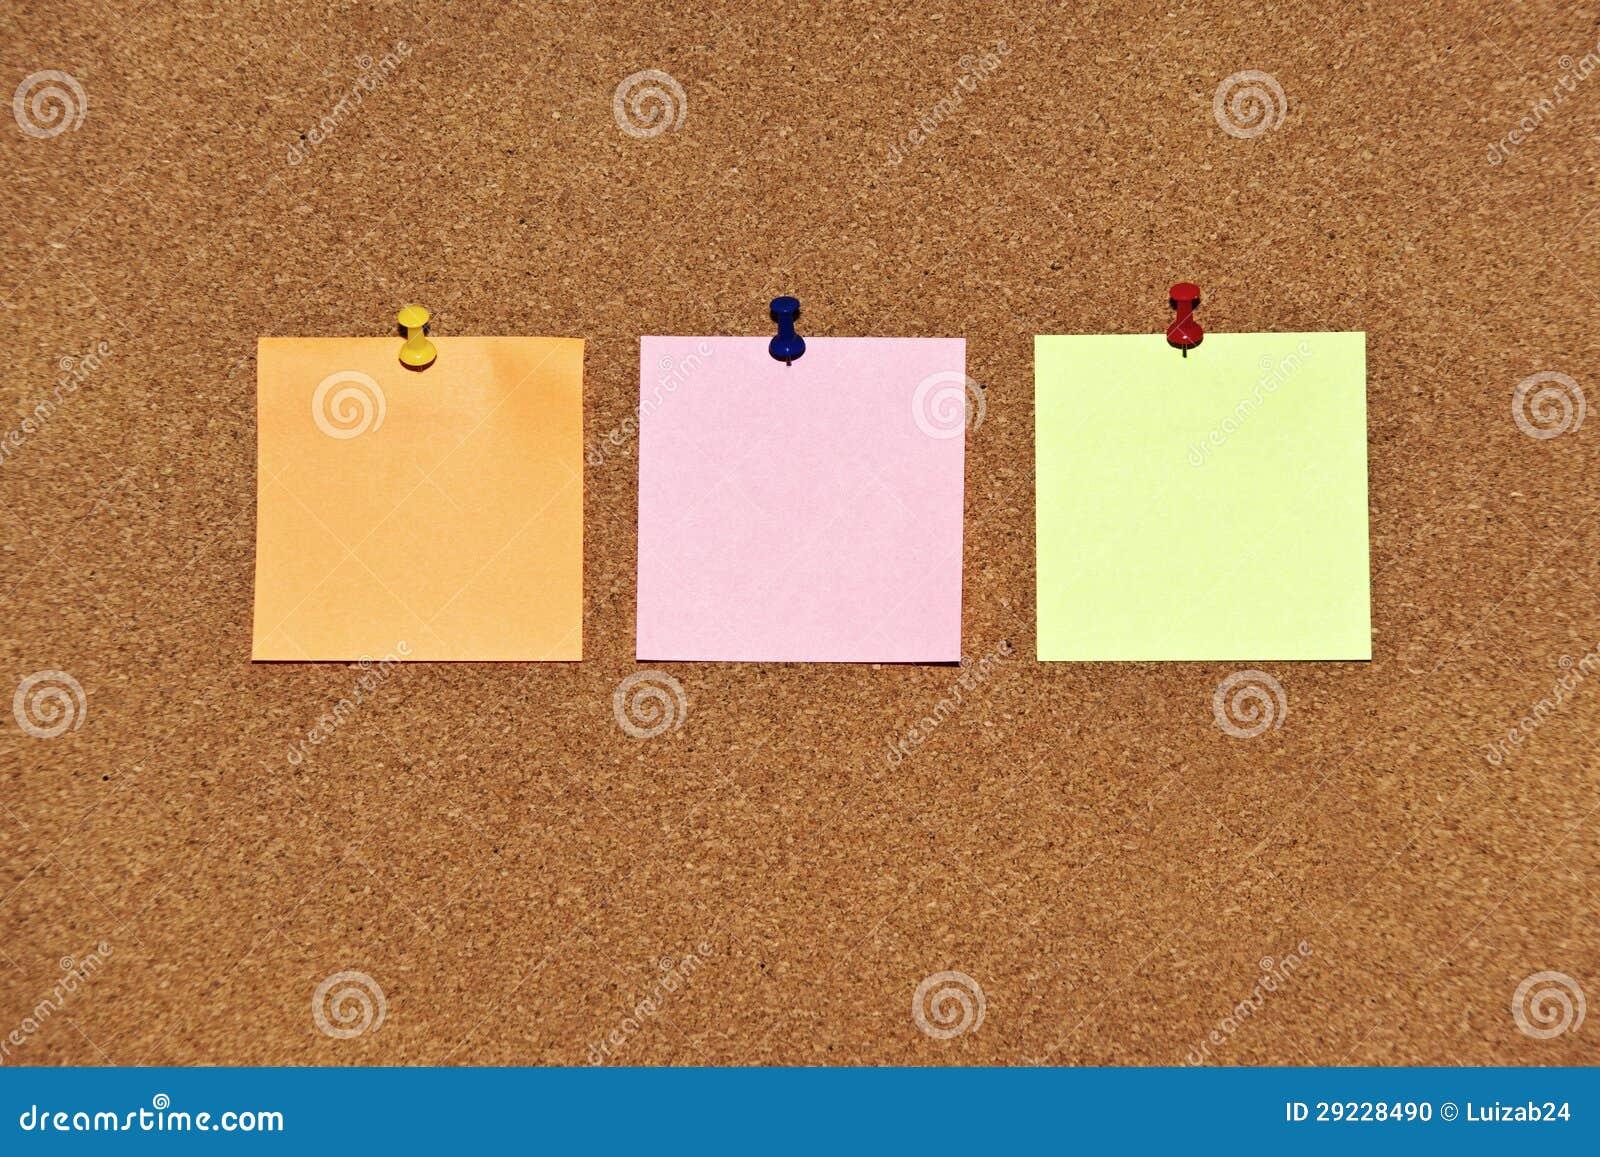 Download Notas de post-it coloridos foto de stock. Imagem de trabalho - 29228490